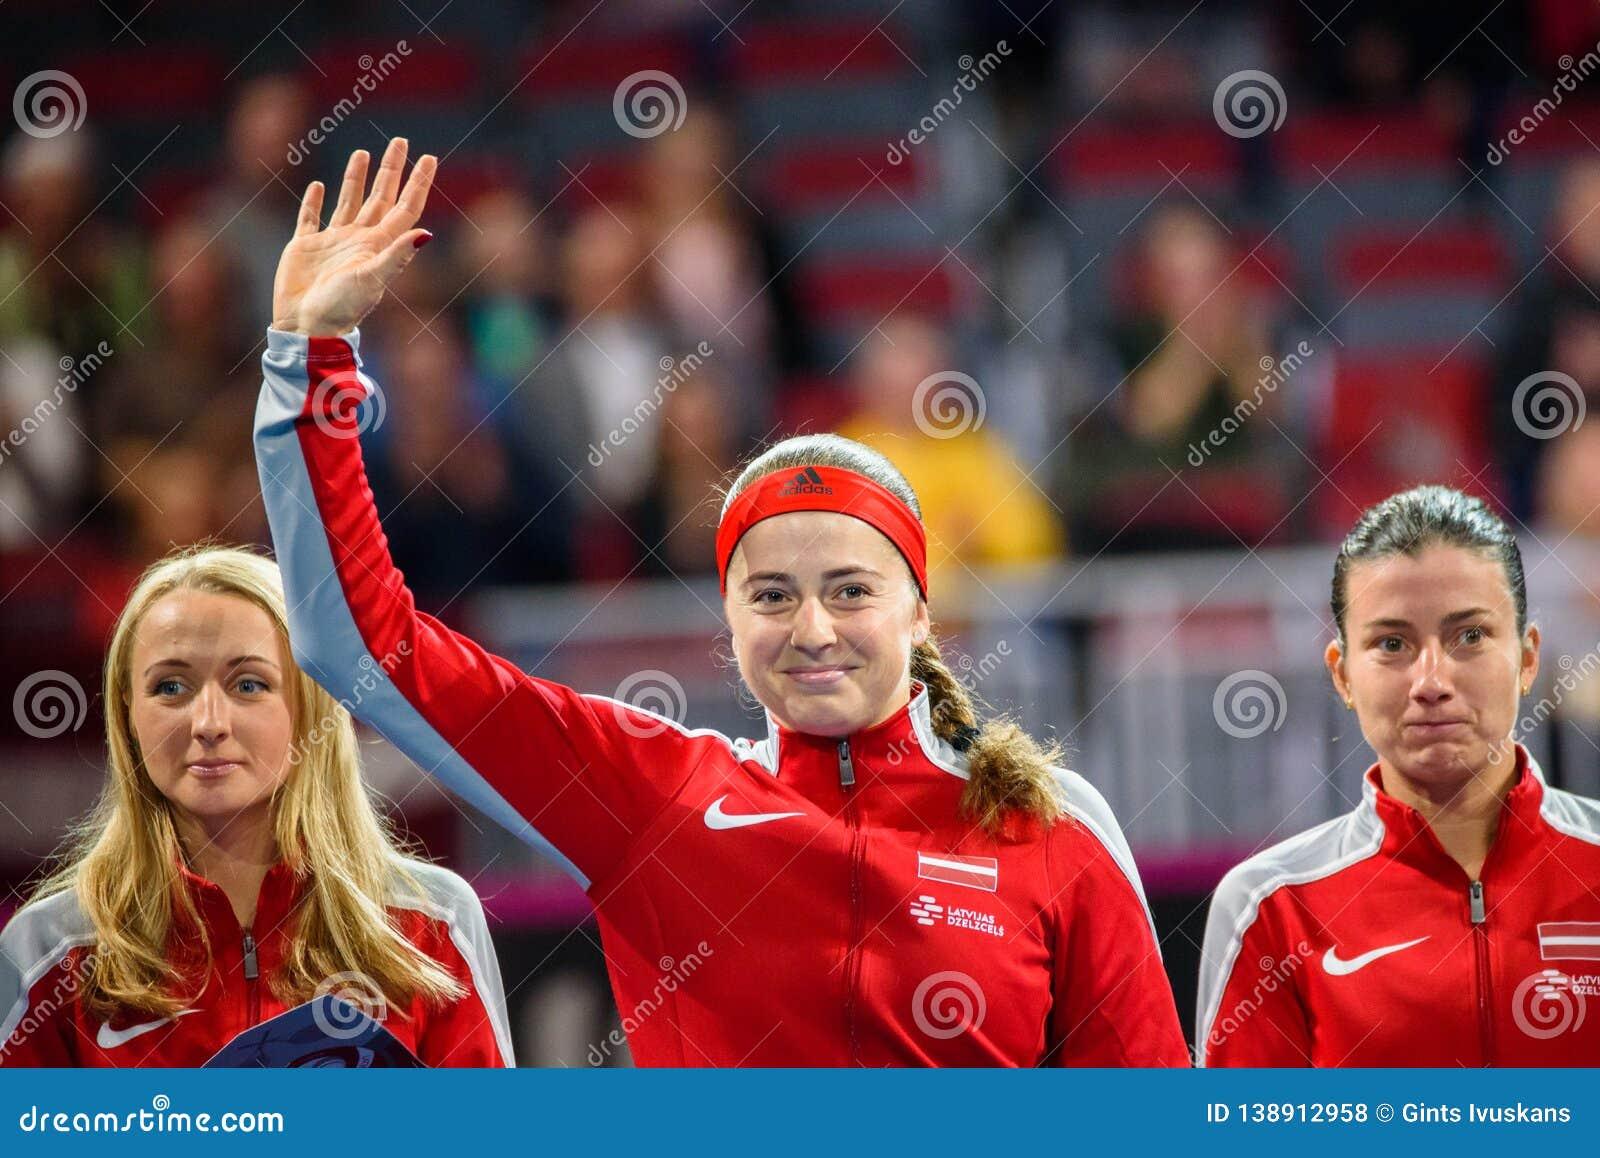 Diana Marcinkevica, Alona Ostapenko e Anastasija Sevastova durante gioco rotondo del gruppo II del mondo il primo